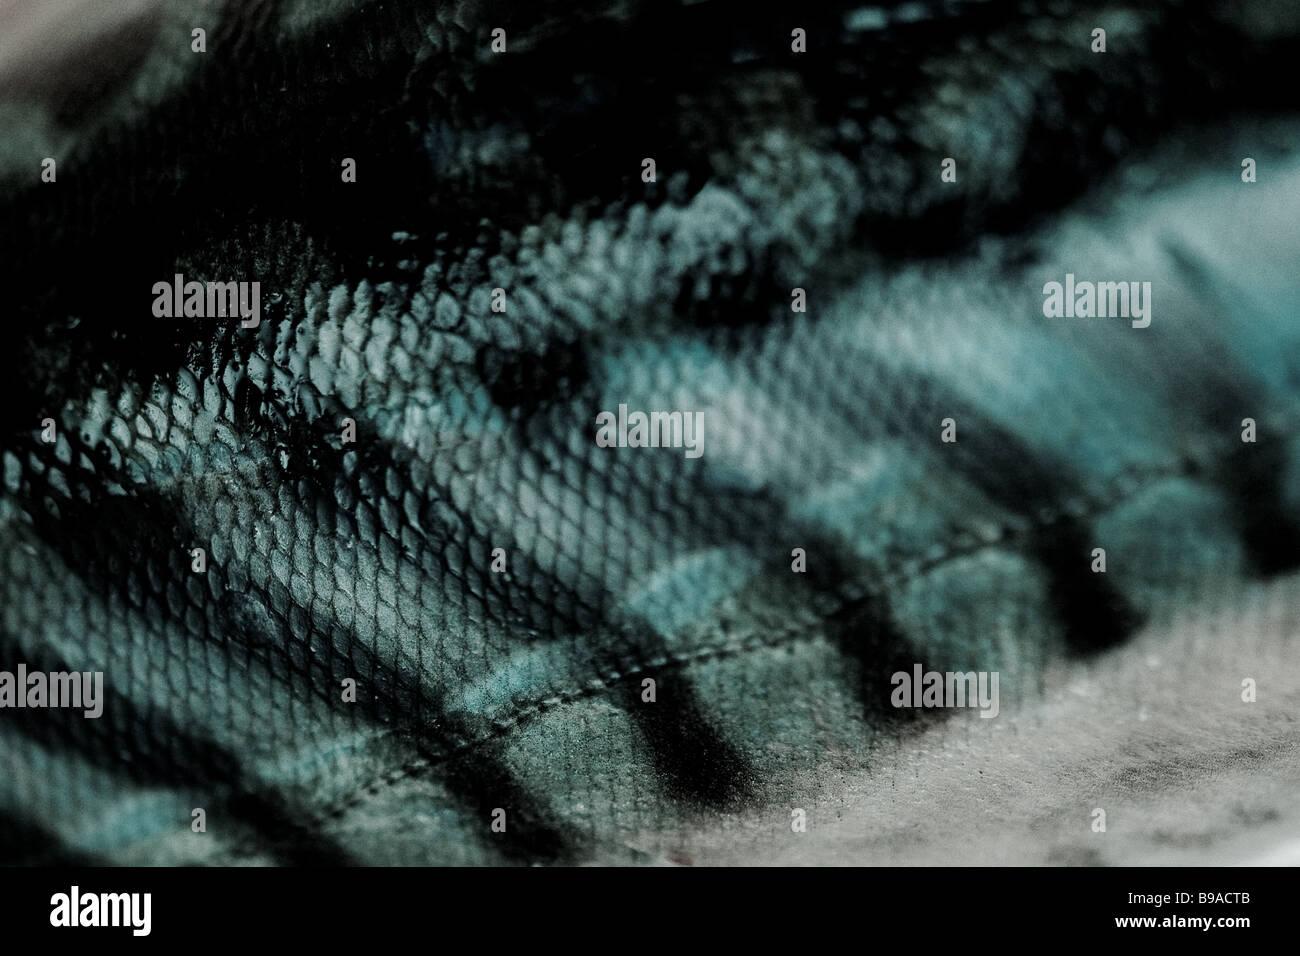 Extreme close up of a mackerel - Stock Image